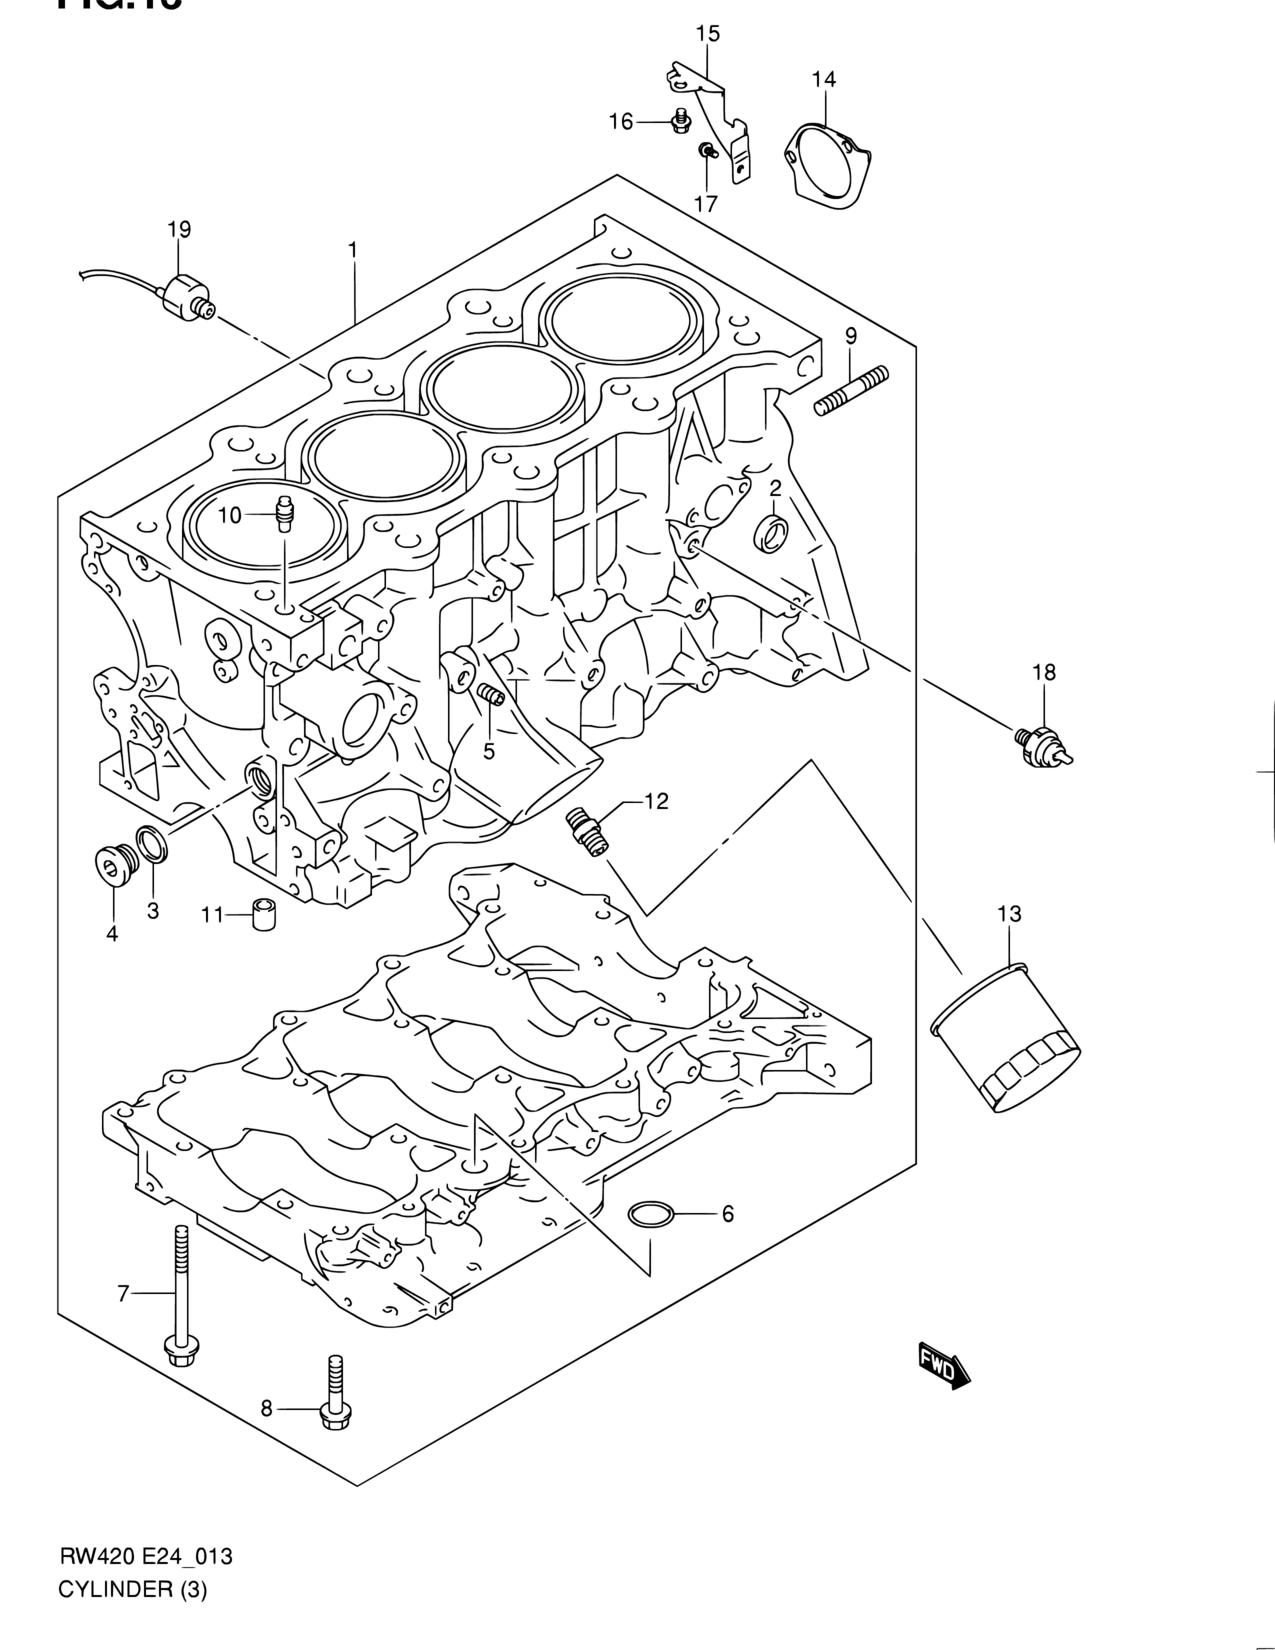 E38 Cylinder Diagram Electrical Wiring Diagrams Engine All Regions Sx4 Rw416 6 E30e38 13 J20a 4